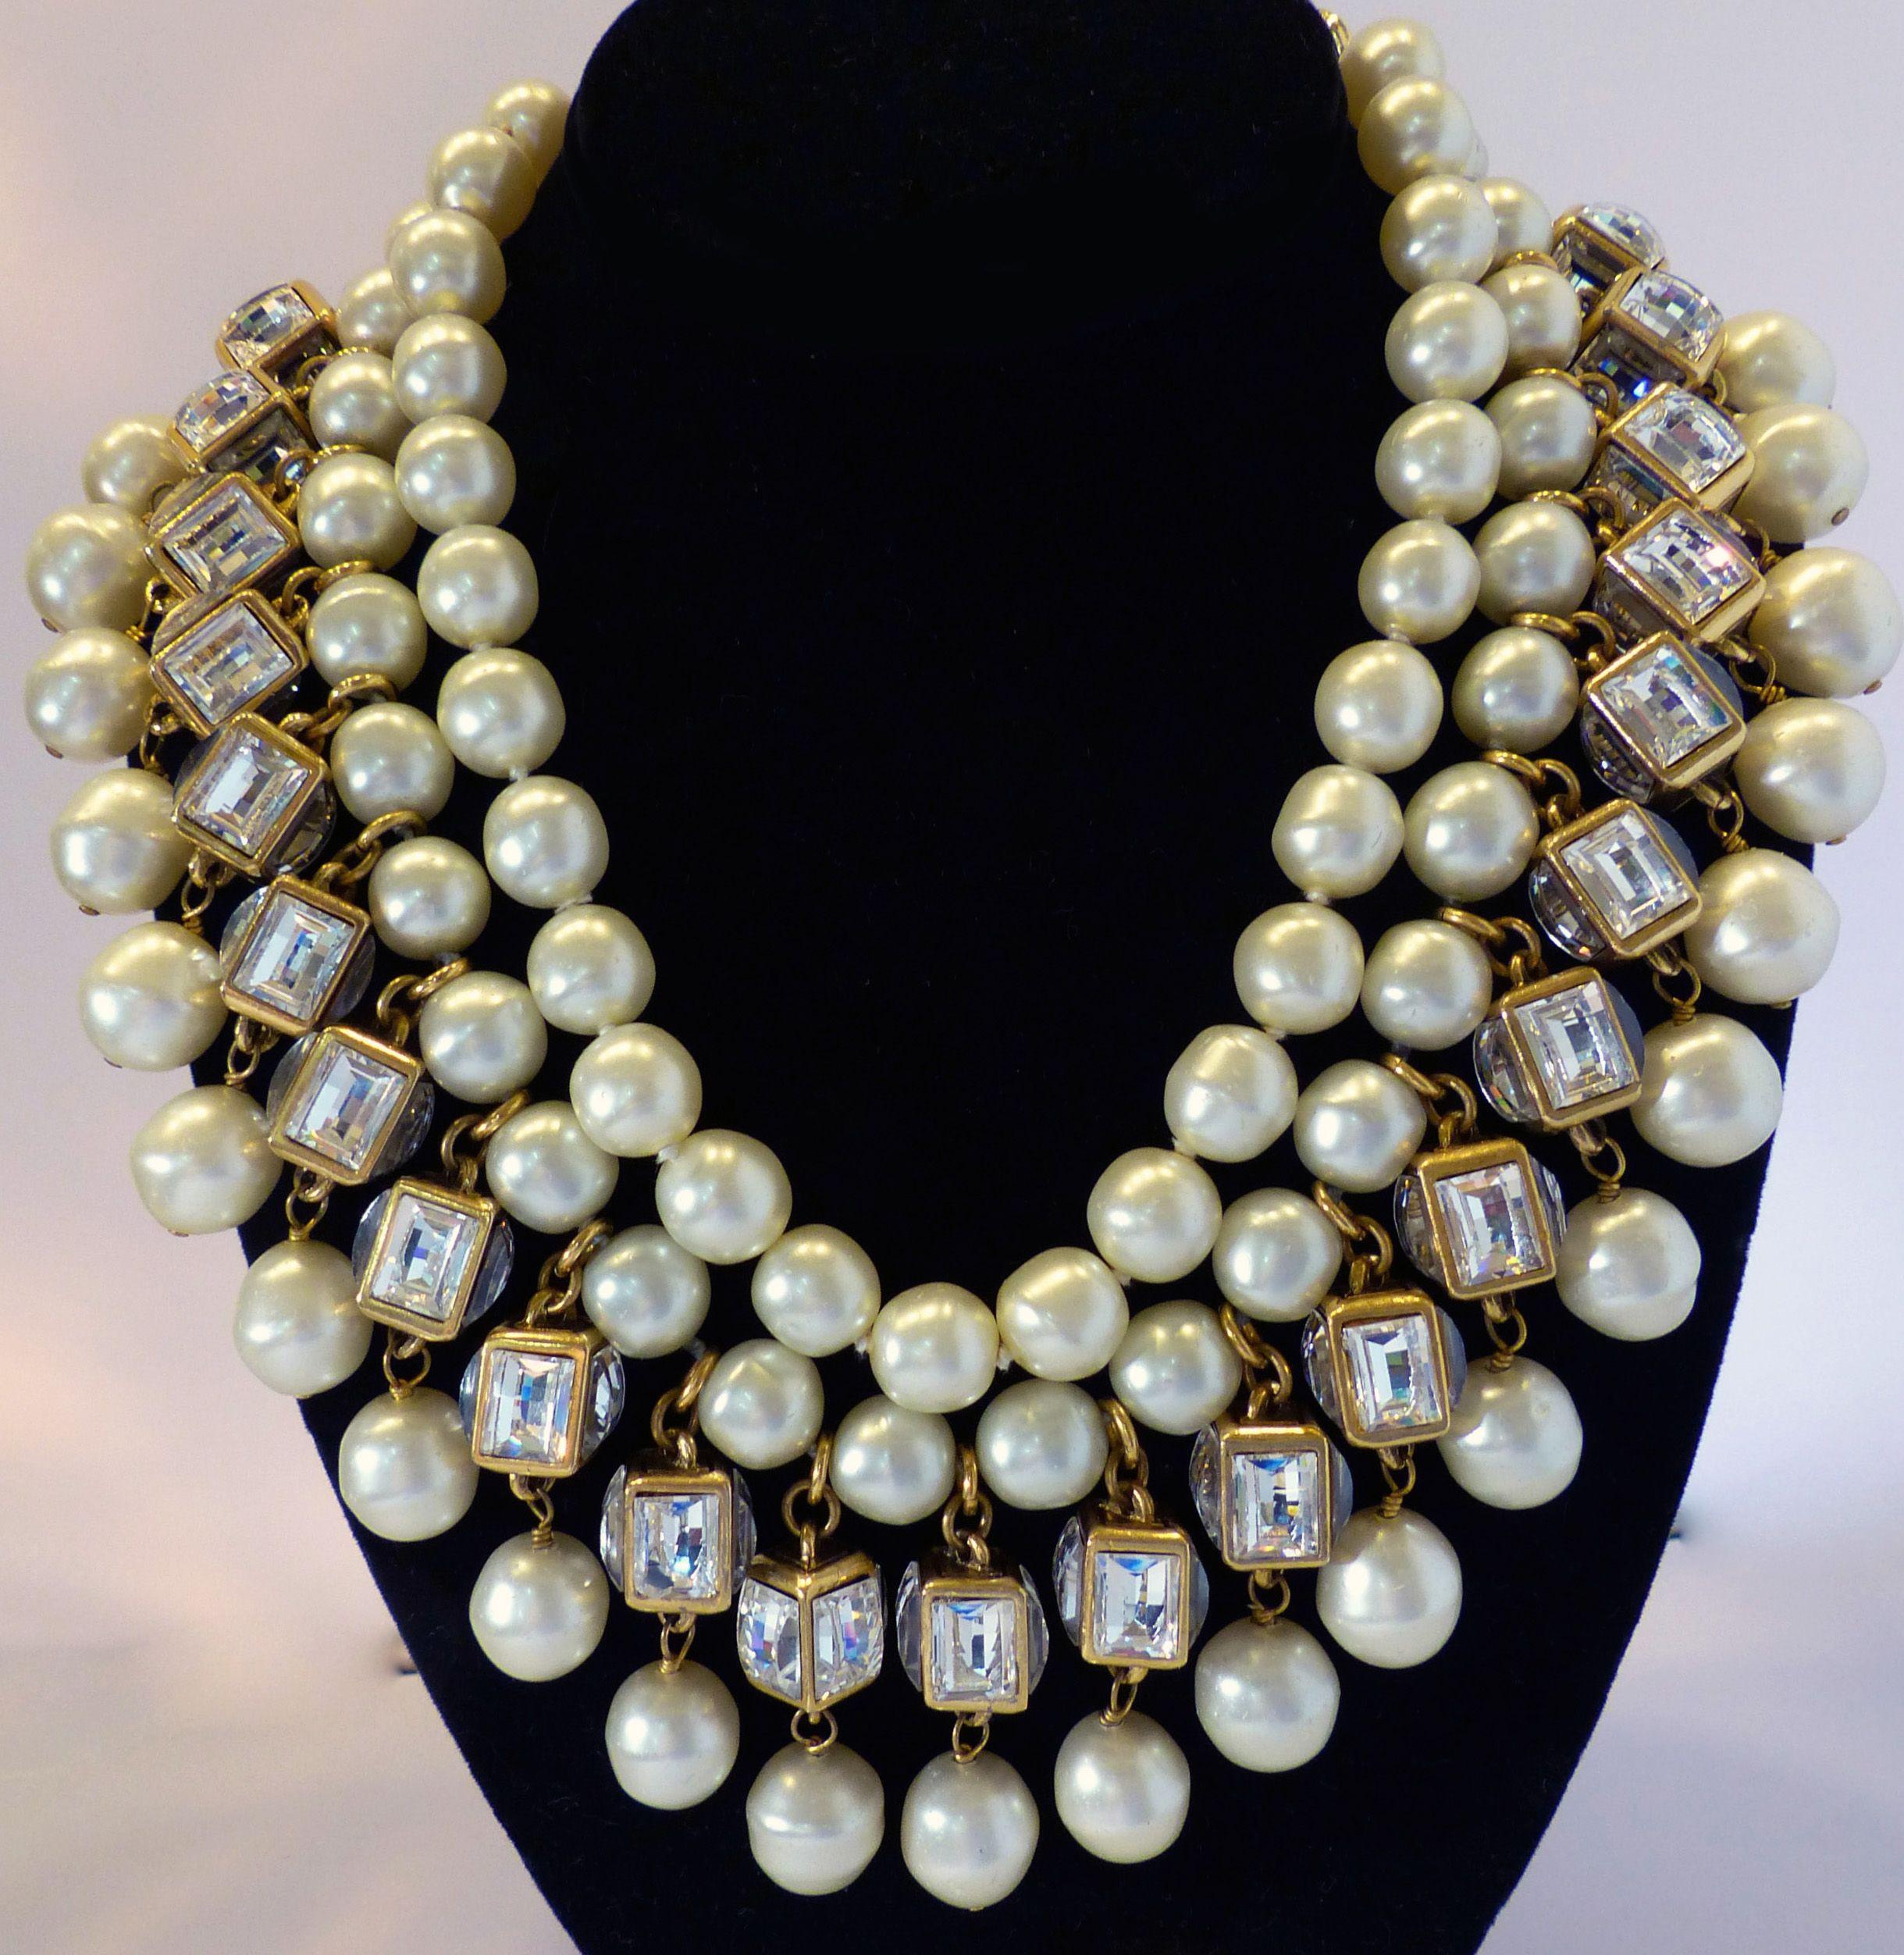 Vintage - Chanel - Collier  Plastron  - Perles Imitation ... 01958e88771